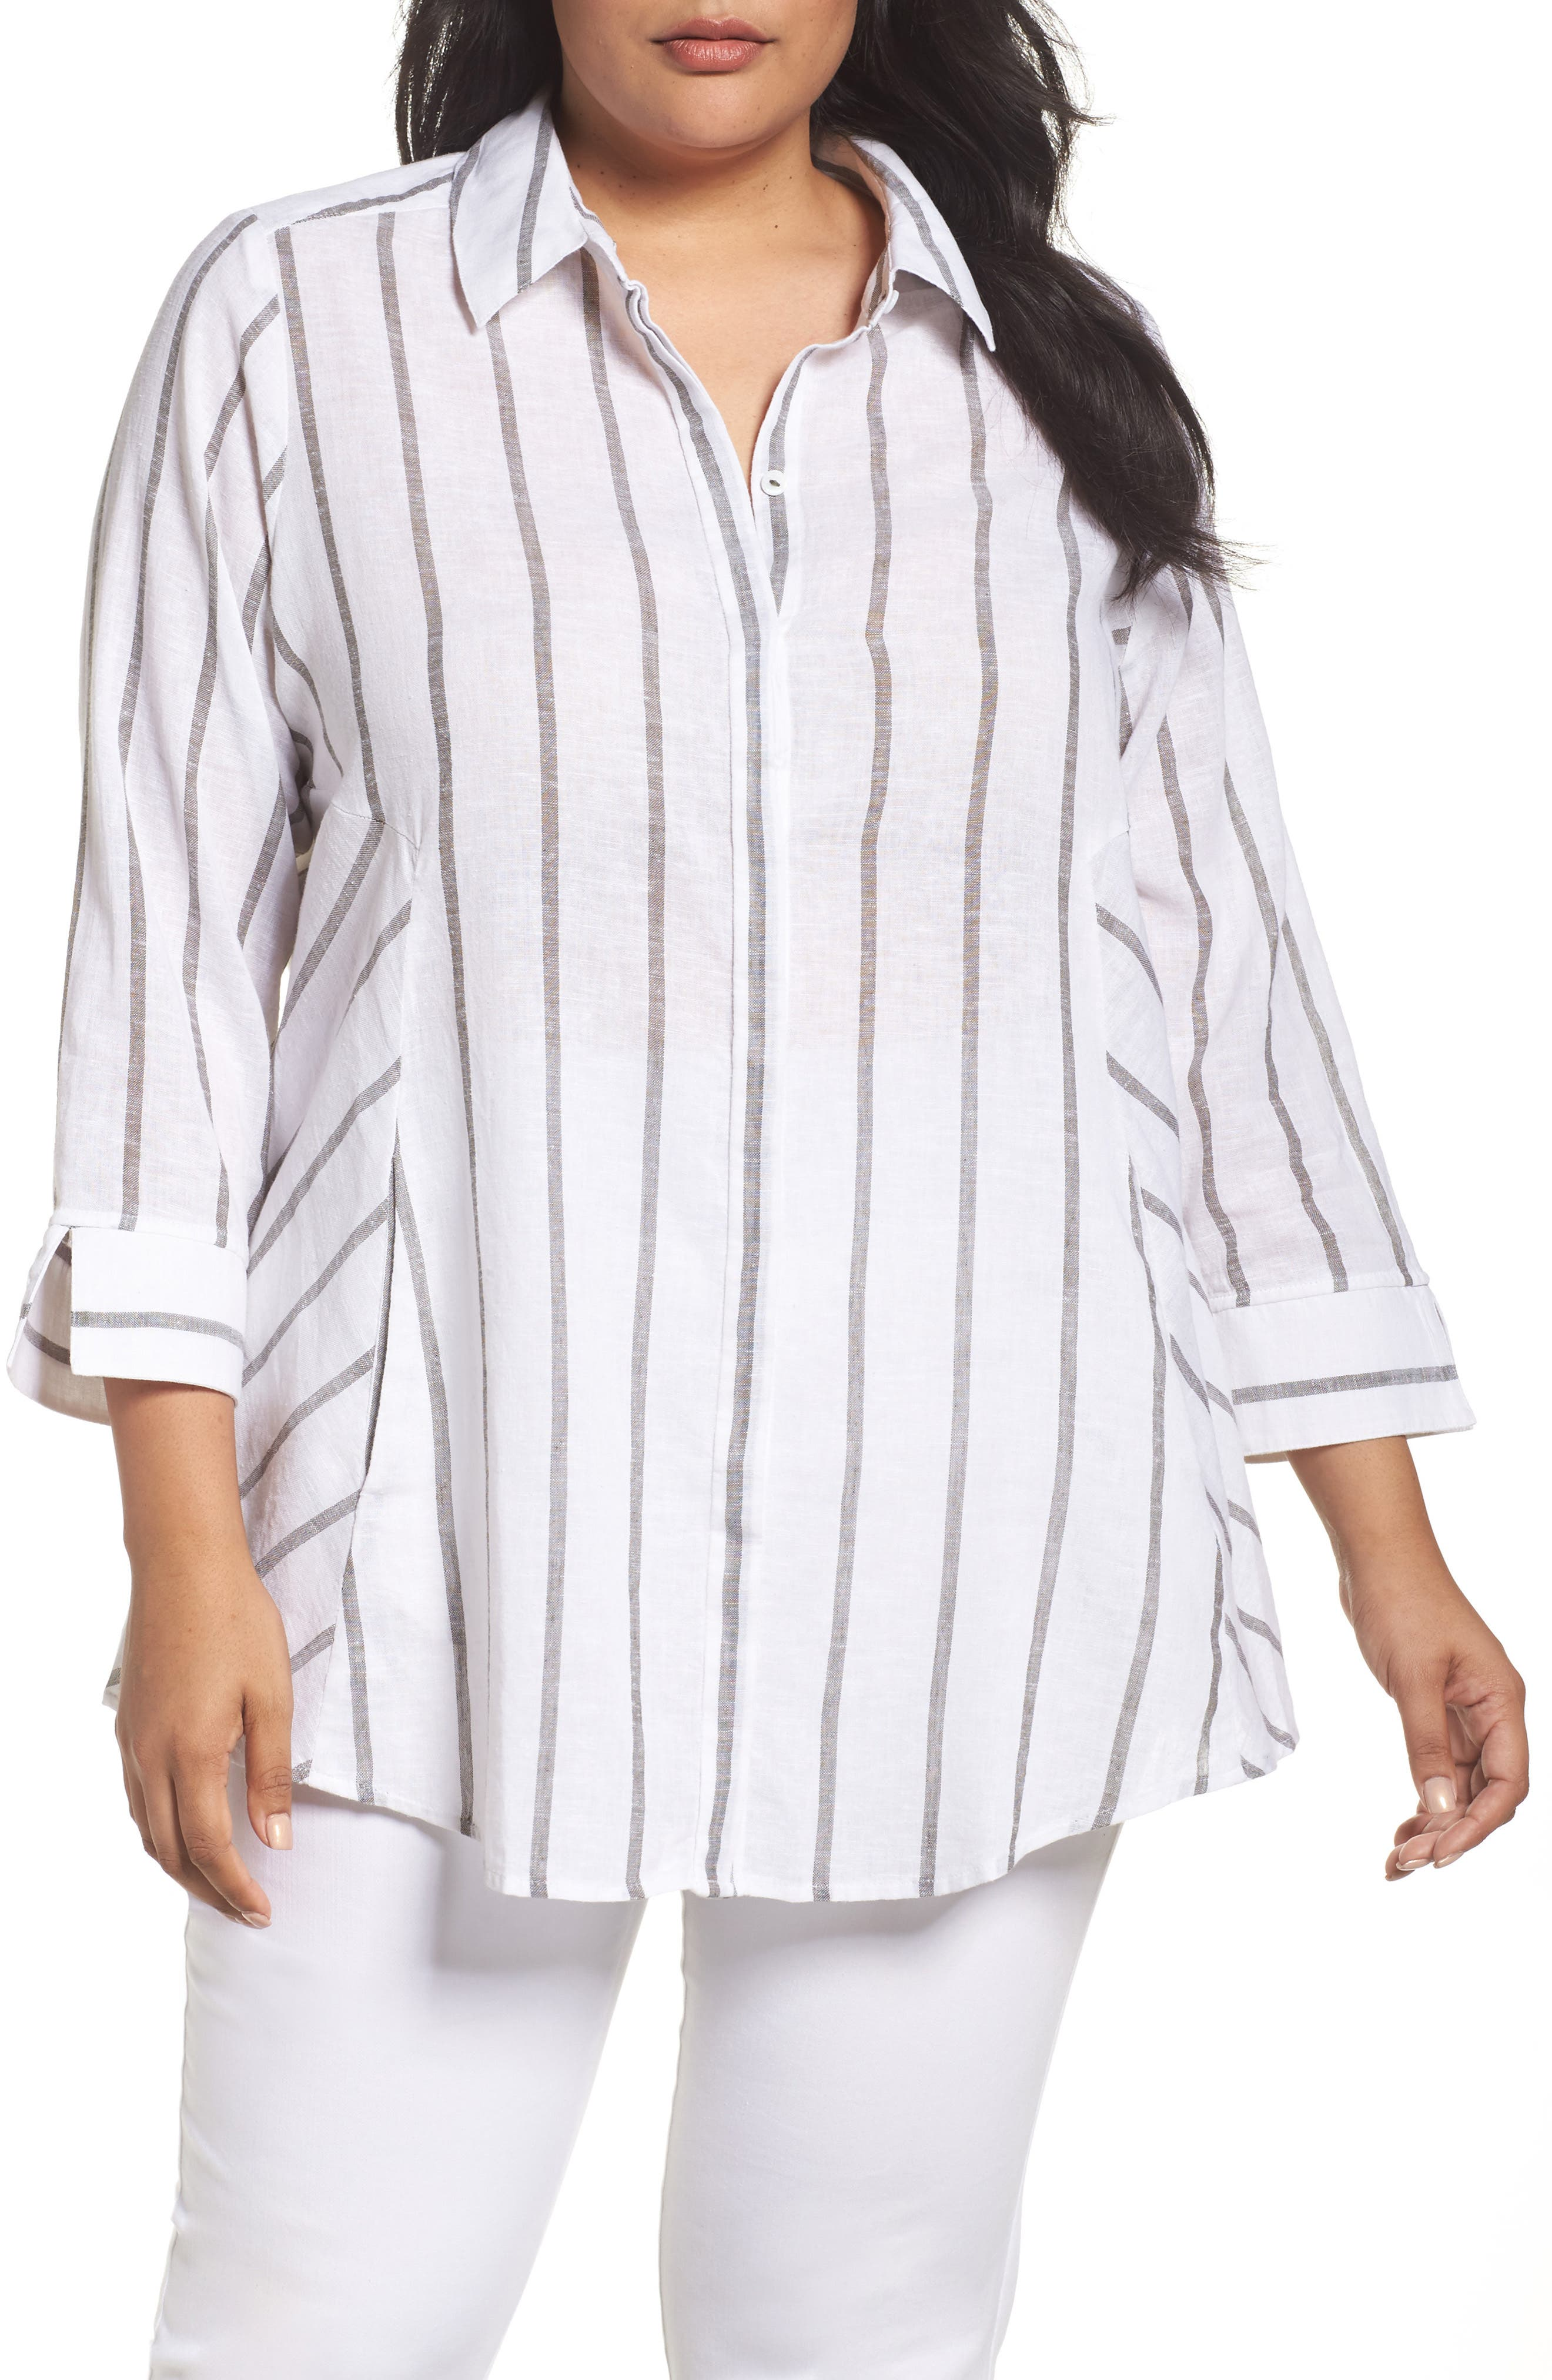 Foxcroft Cici Summer Stripe Tunic (Plus Size)